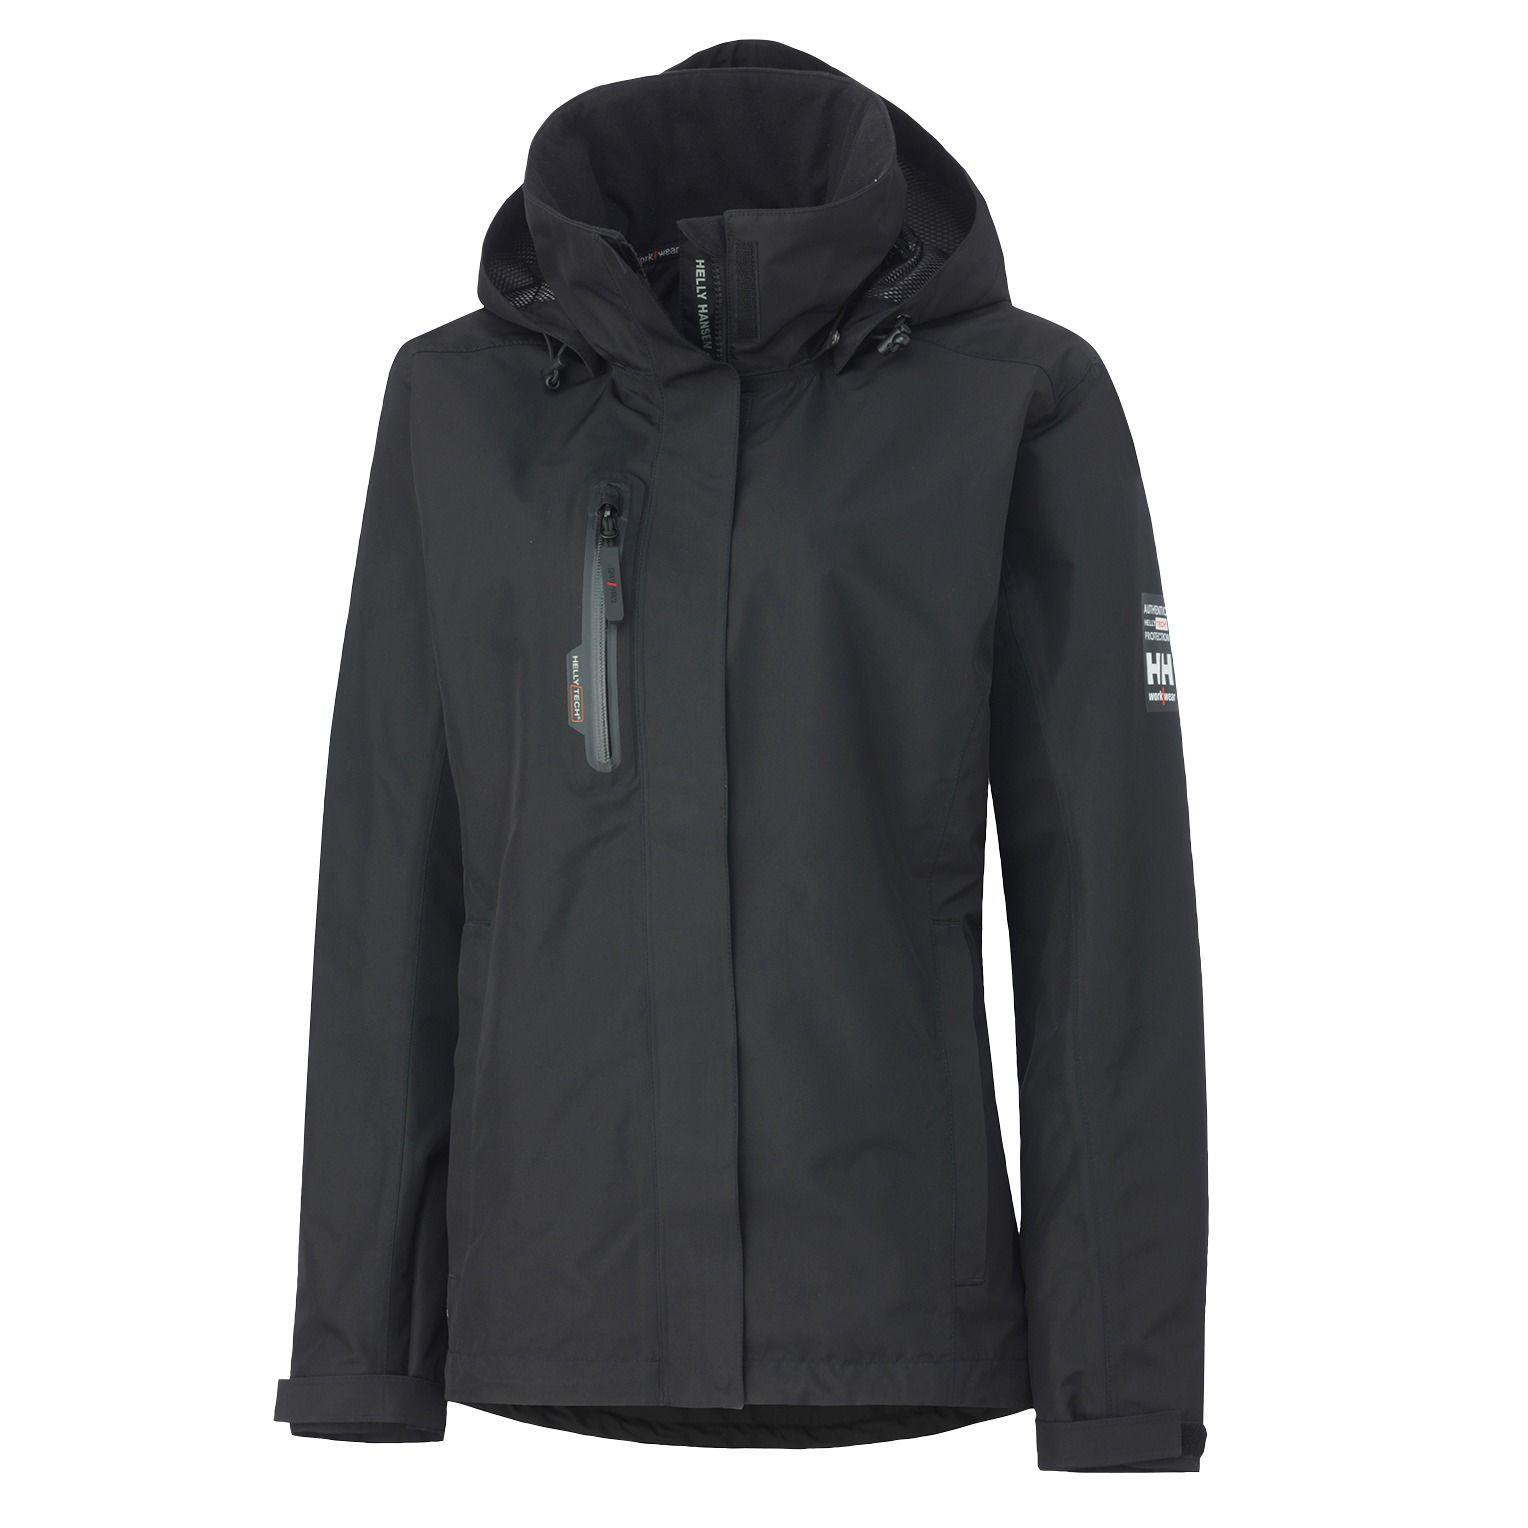 Куртка Helly Hansen W Haag Jacket - 74044 (Black; M)